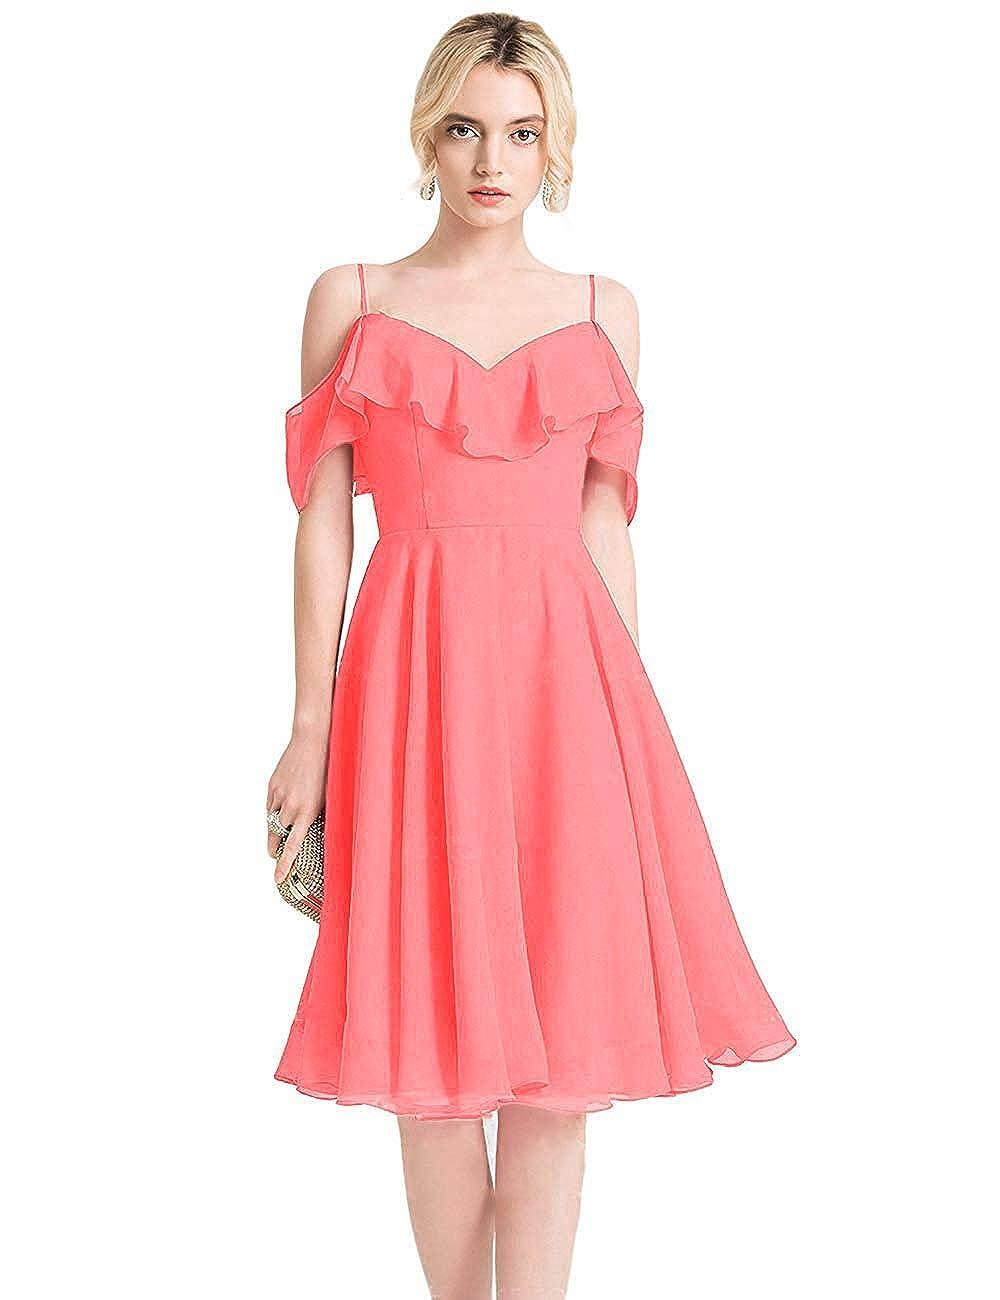 CoralB FeiYueXinXing VNeck Ruffled Spaghetti Strap Prom Dresses Long Formal Evening Gown